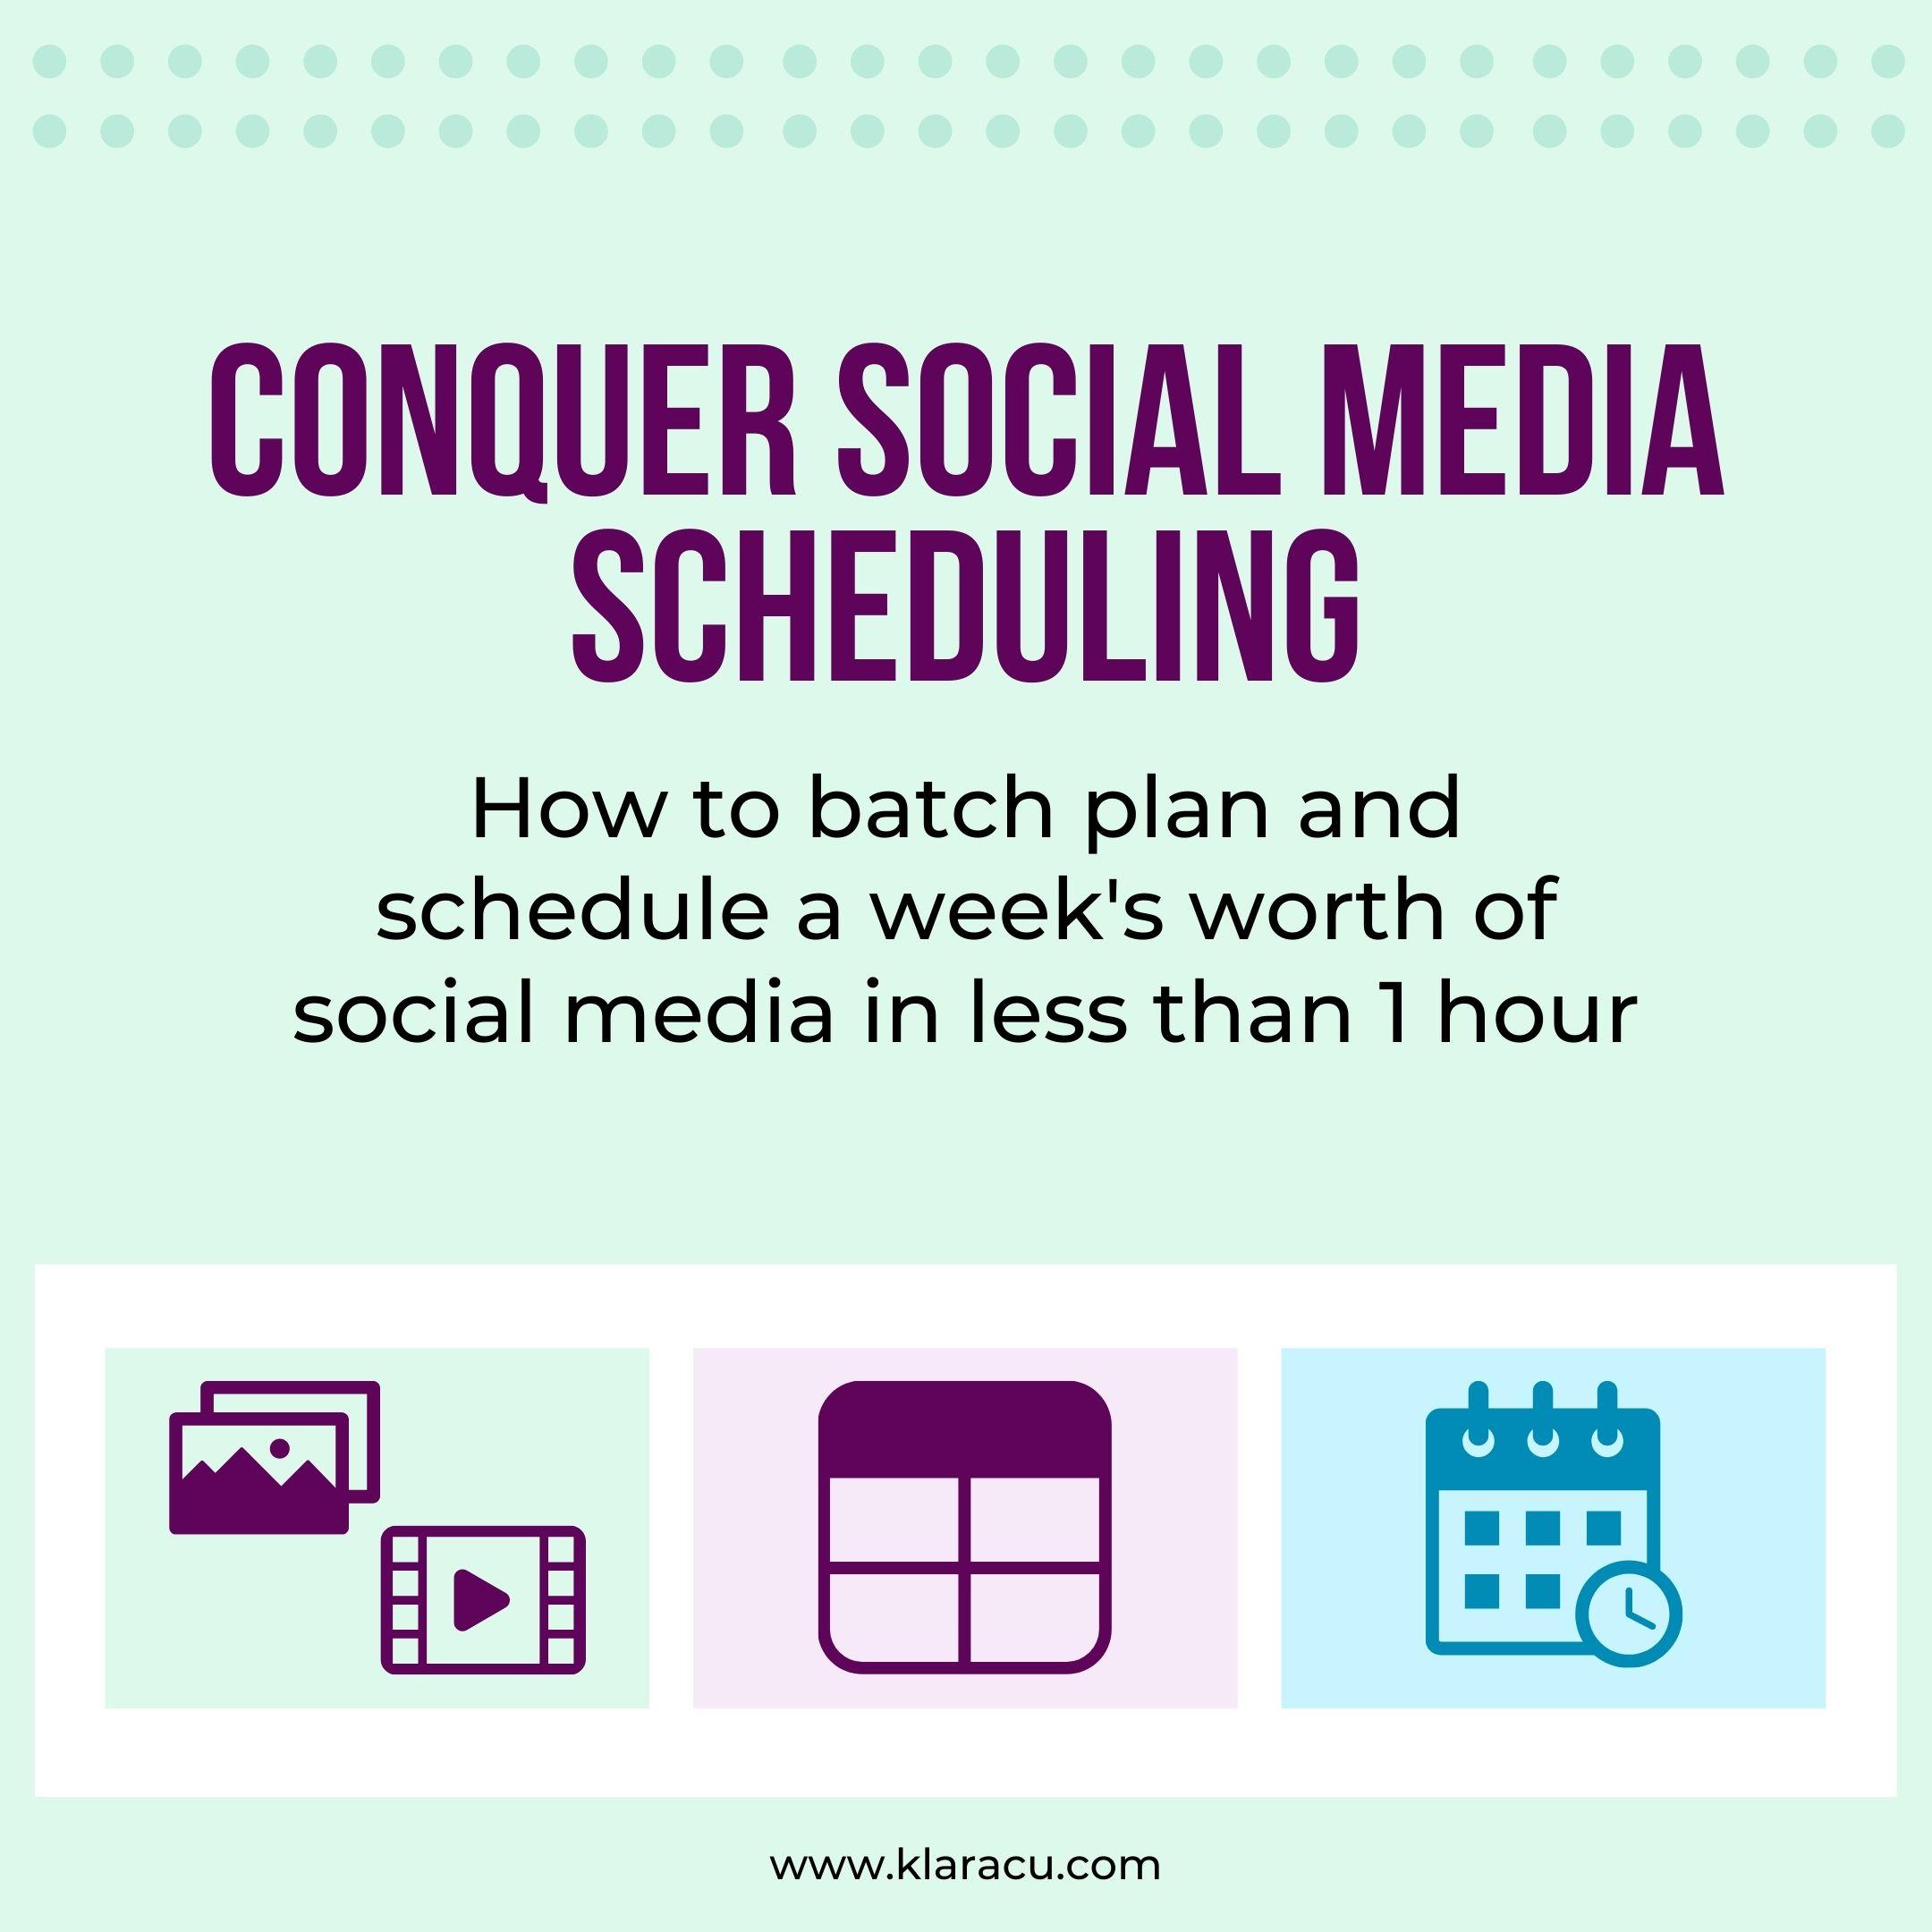 conquer-social-media-scheduling